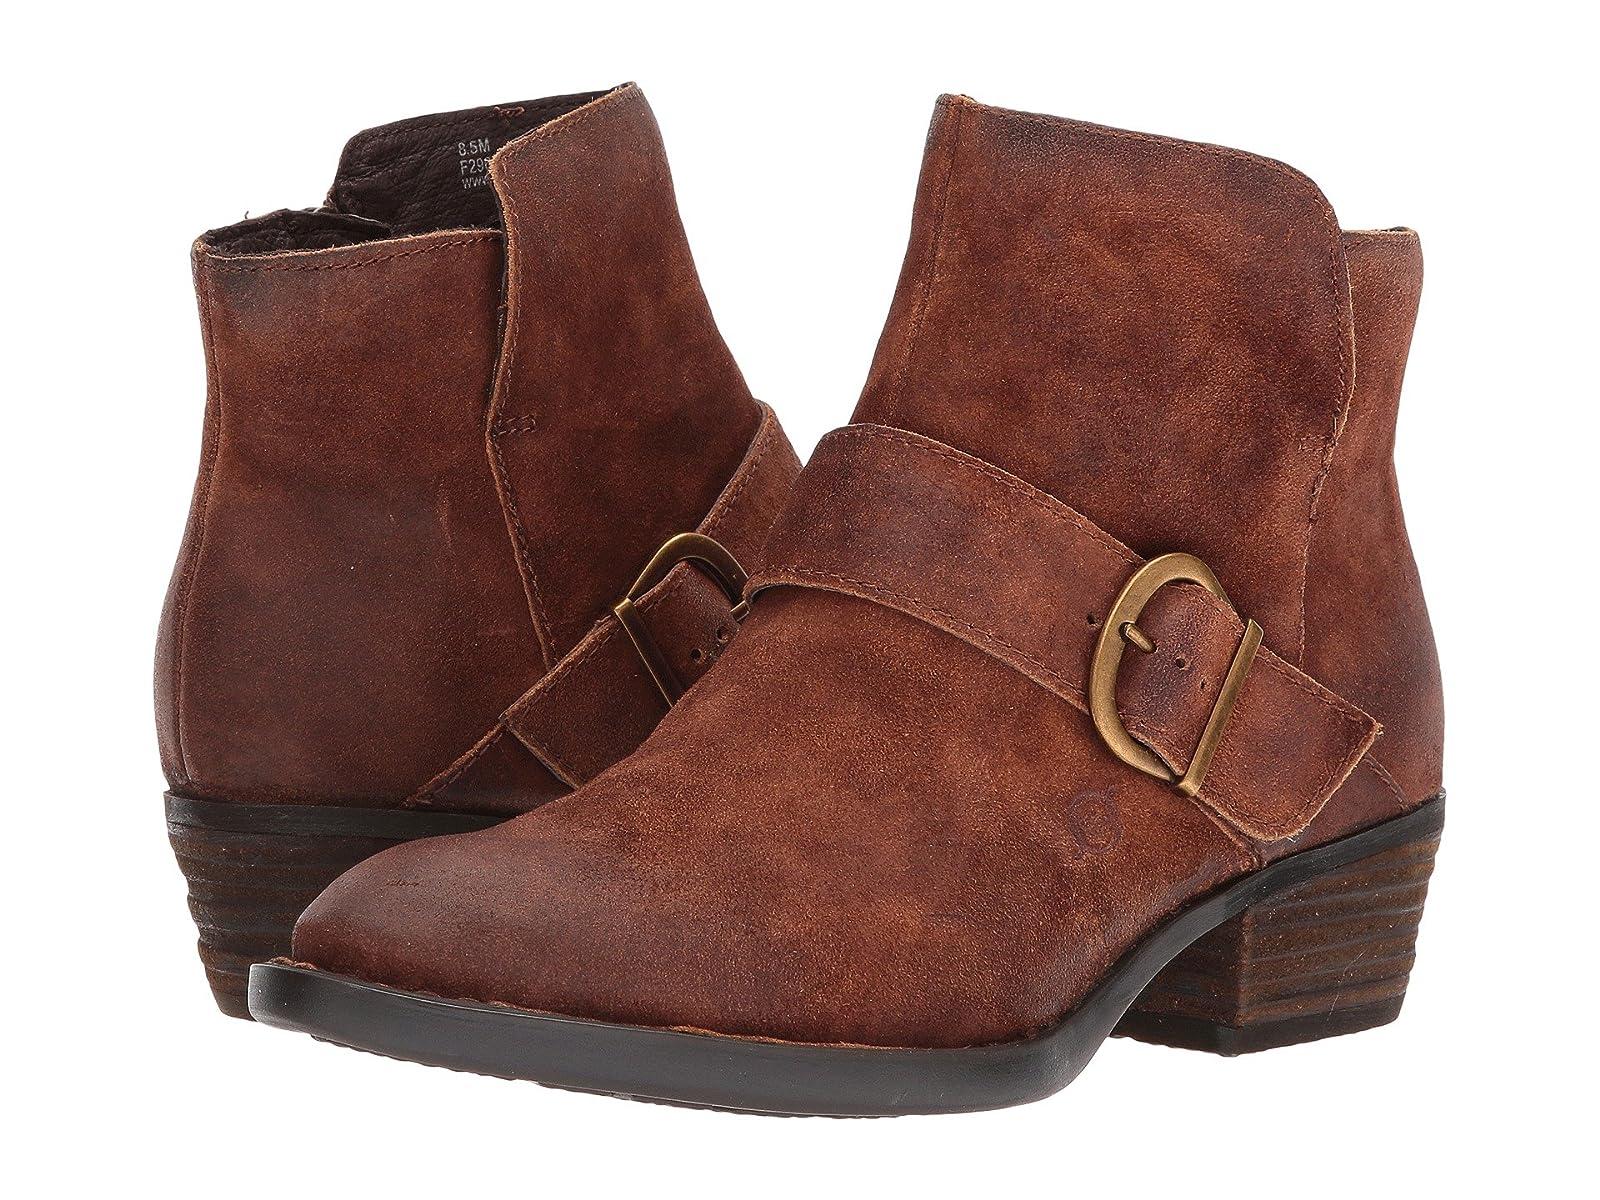 Born BaloyCheap and distinctive eye-catching shoes